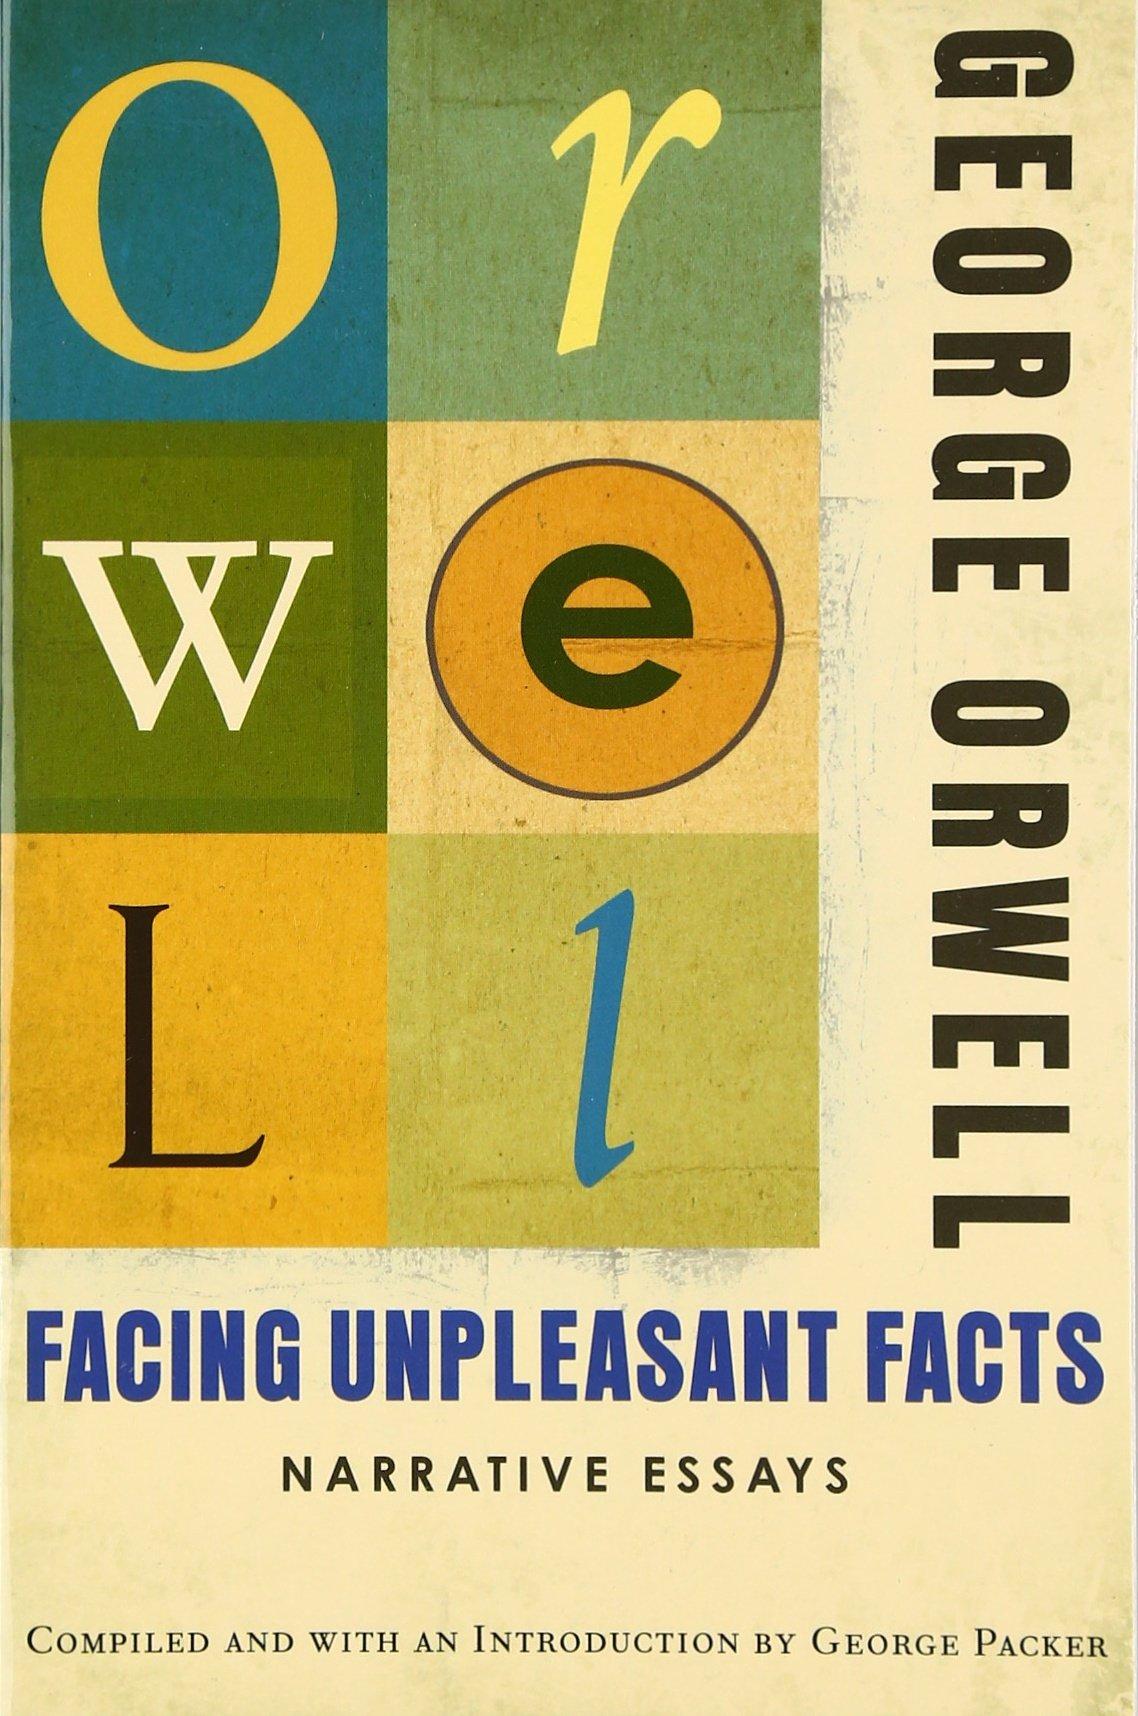 023 Essay Example 817mi1ypesl George Orwell Frightening Essays 1984 Summary Collected Pdf On Writing Full